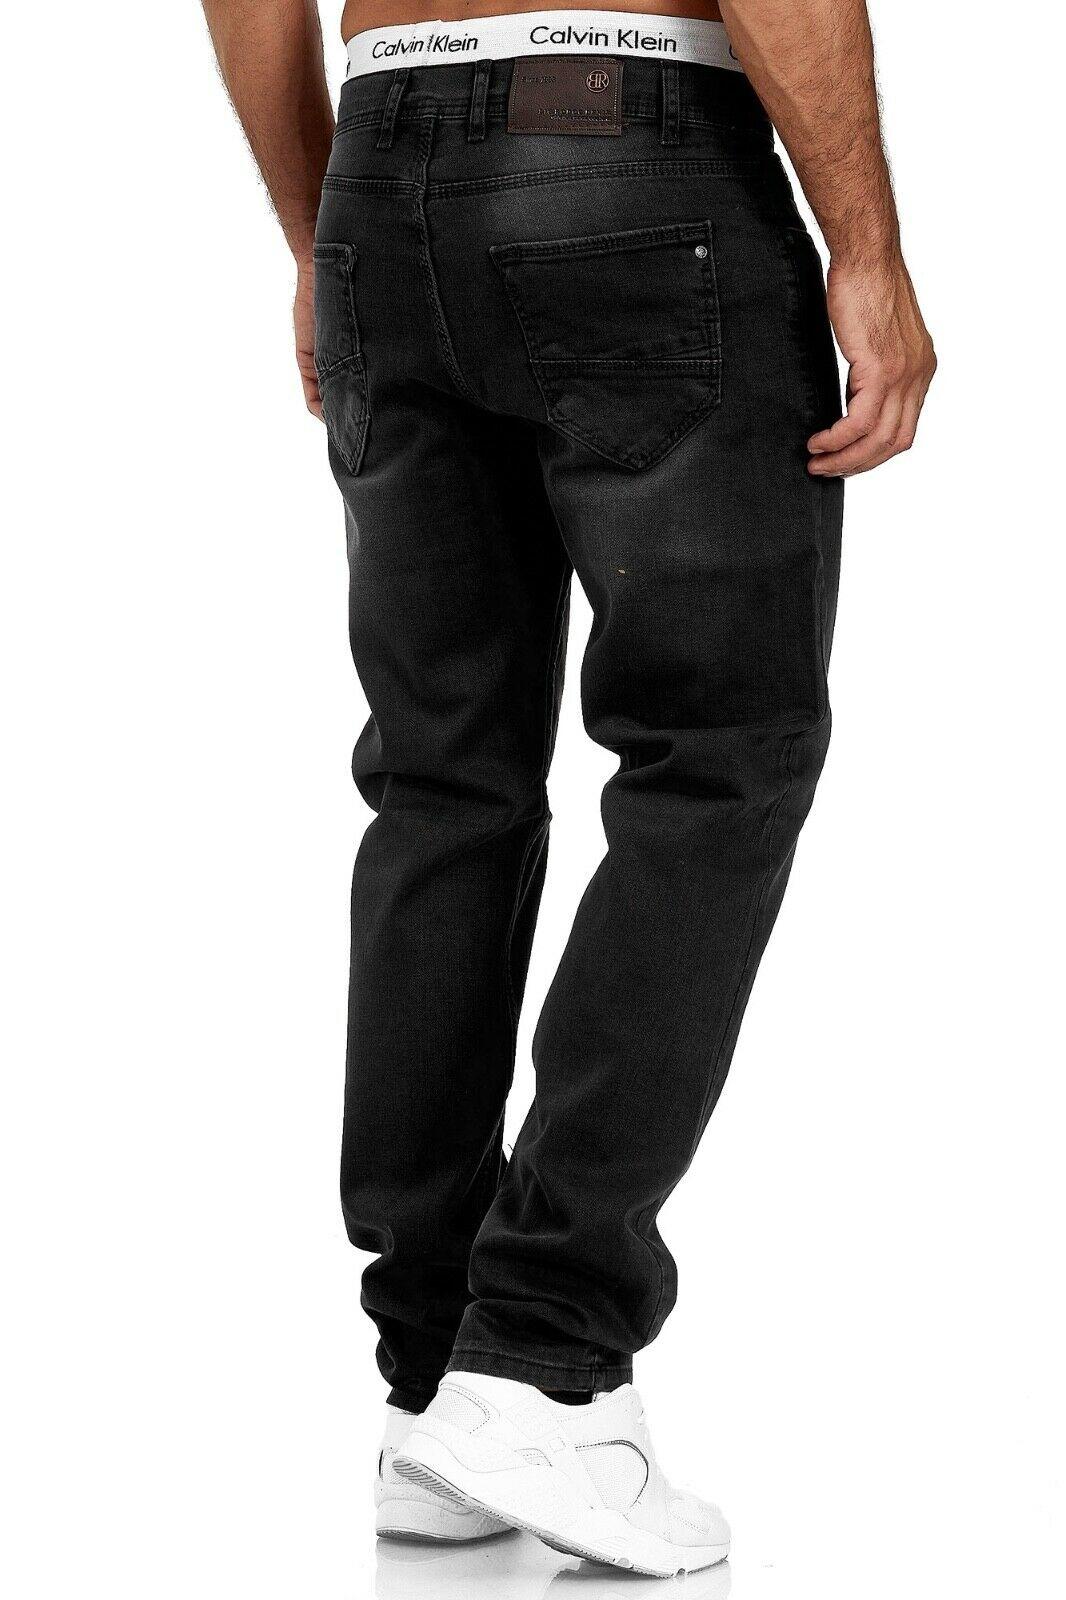 Herren-Jeans-Hose-Denim-KC-Black-Washed-Straight-Cut-Regular-Dicke-Naht-naehte Indexbild 54